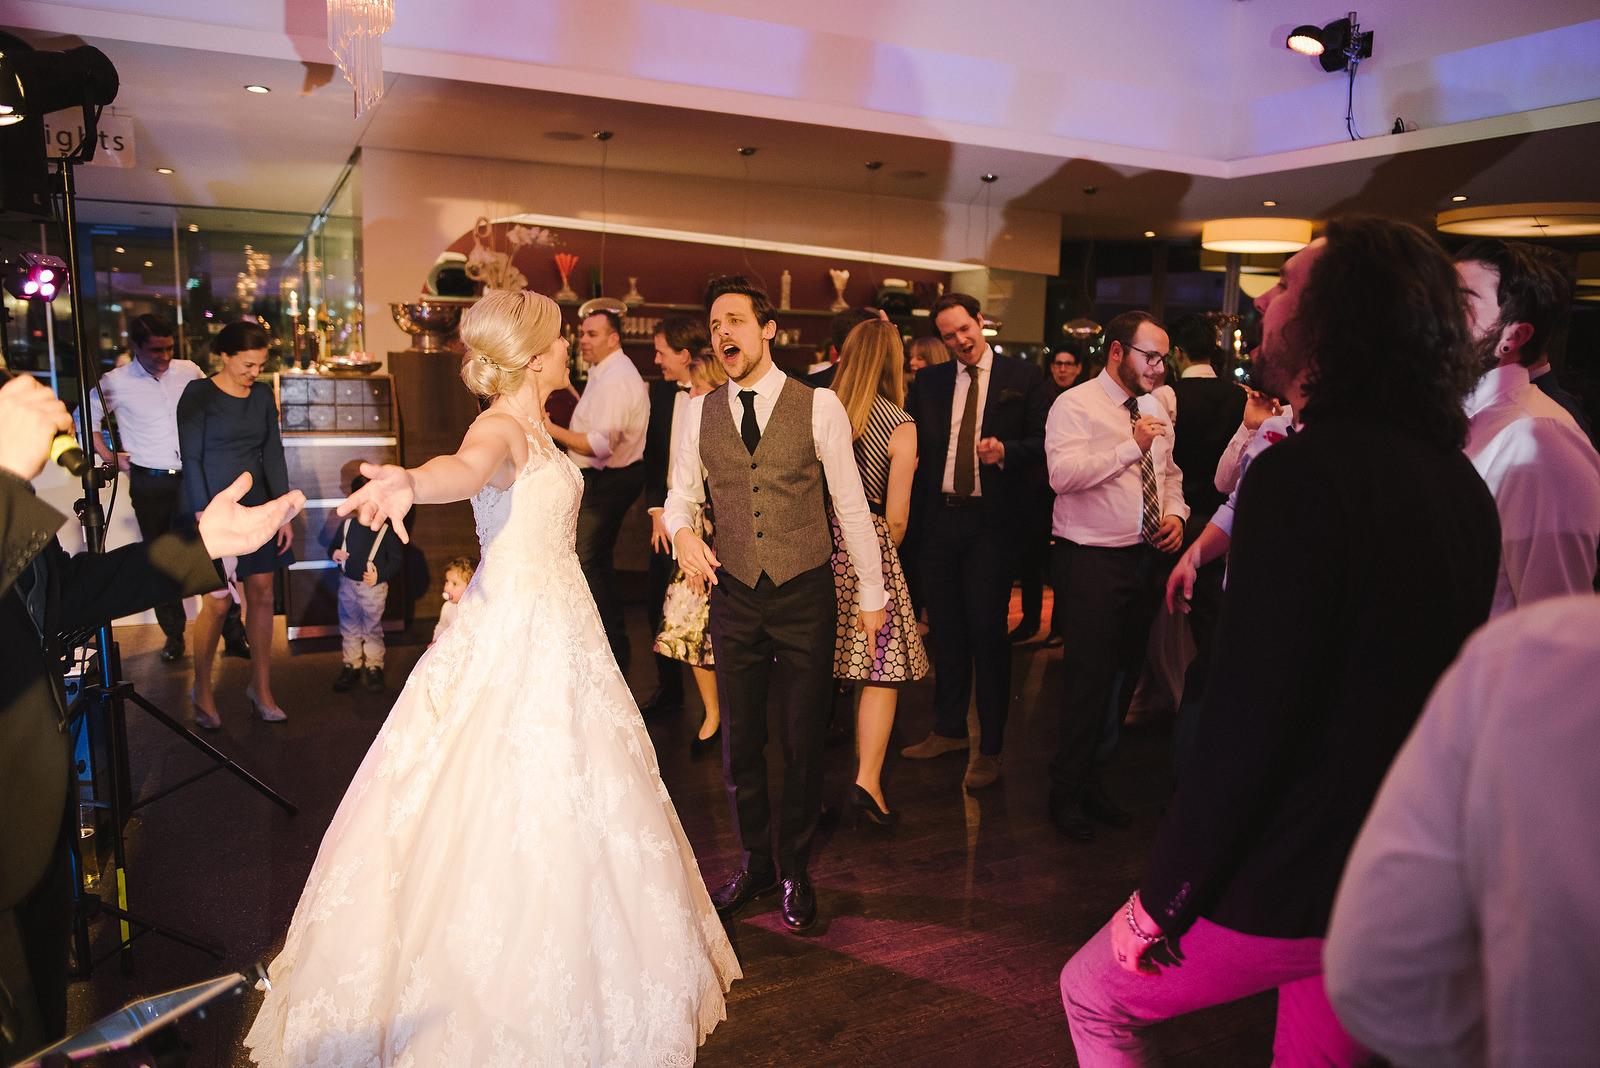 Fotograf Konstanz - Silvester Wedding in Hagnau / Friedrichshafen at Lake of Constance  - 49 -